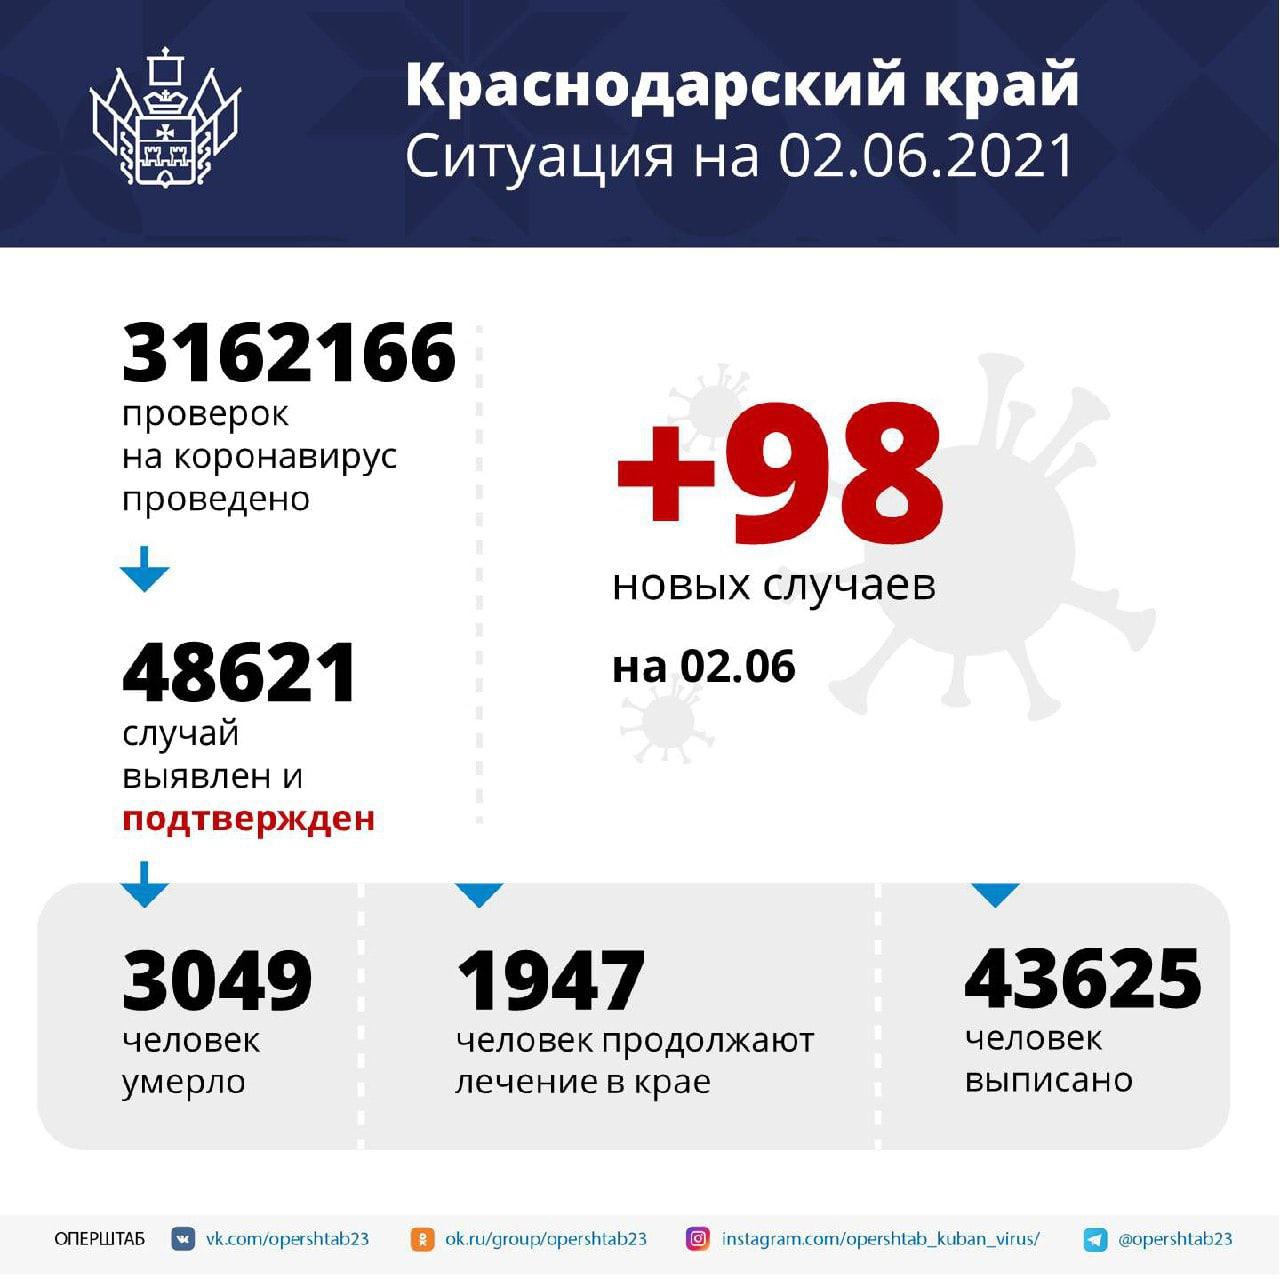 На Кубани за сутки зарегистрировали 98 случаев COVID-19Заболевших...